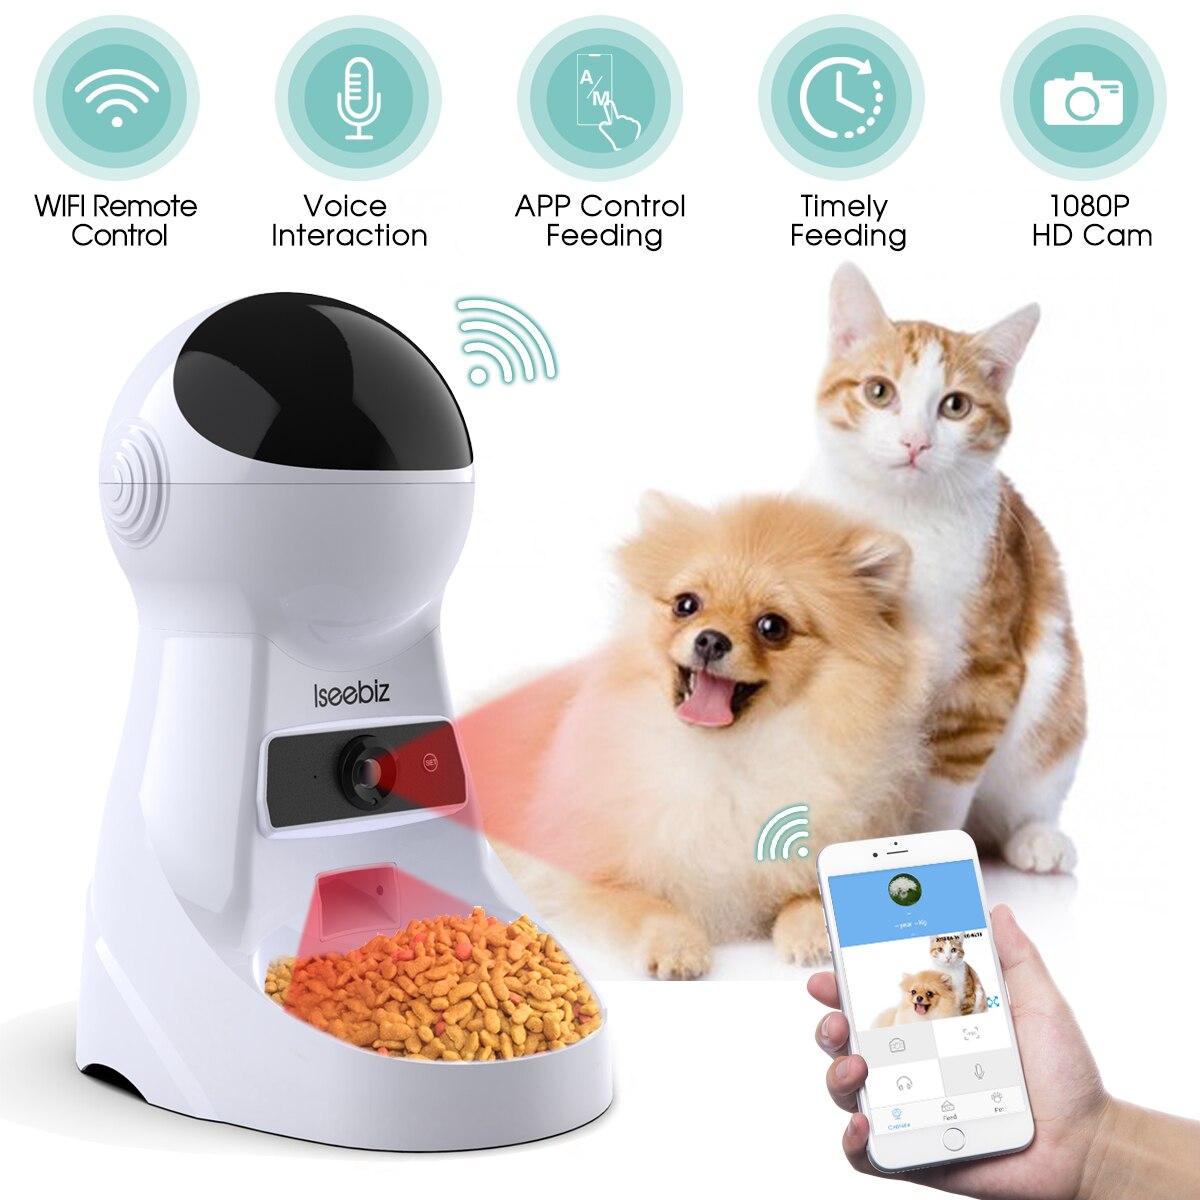 Iseebiz 3L Automatic Pet Feeder With Voice Record Pets food Bowl 23 » Pets Impress